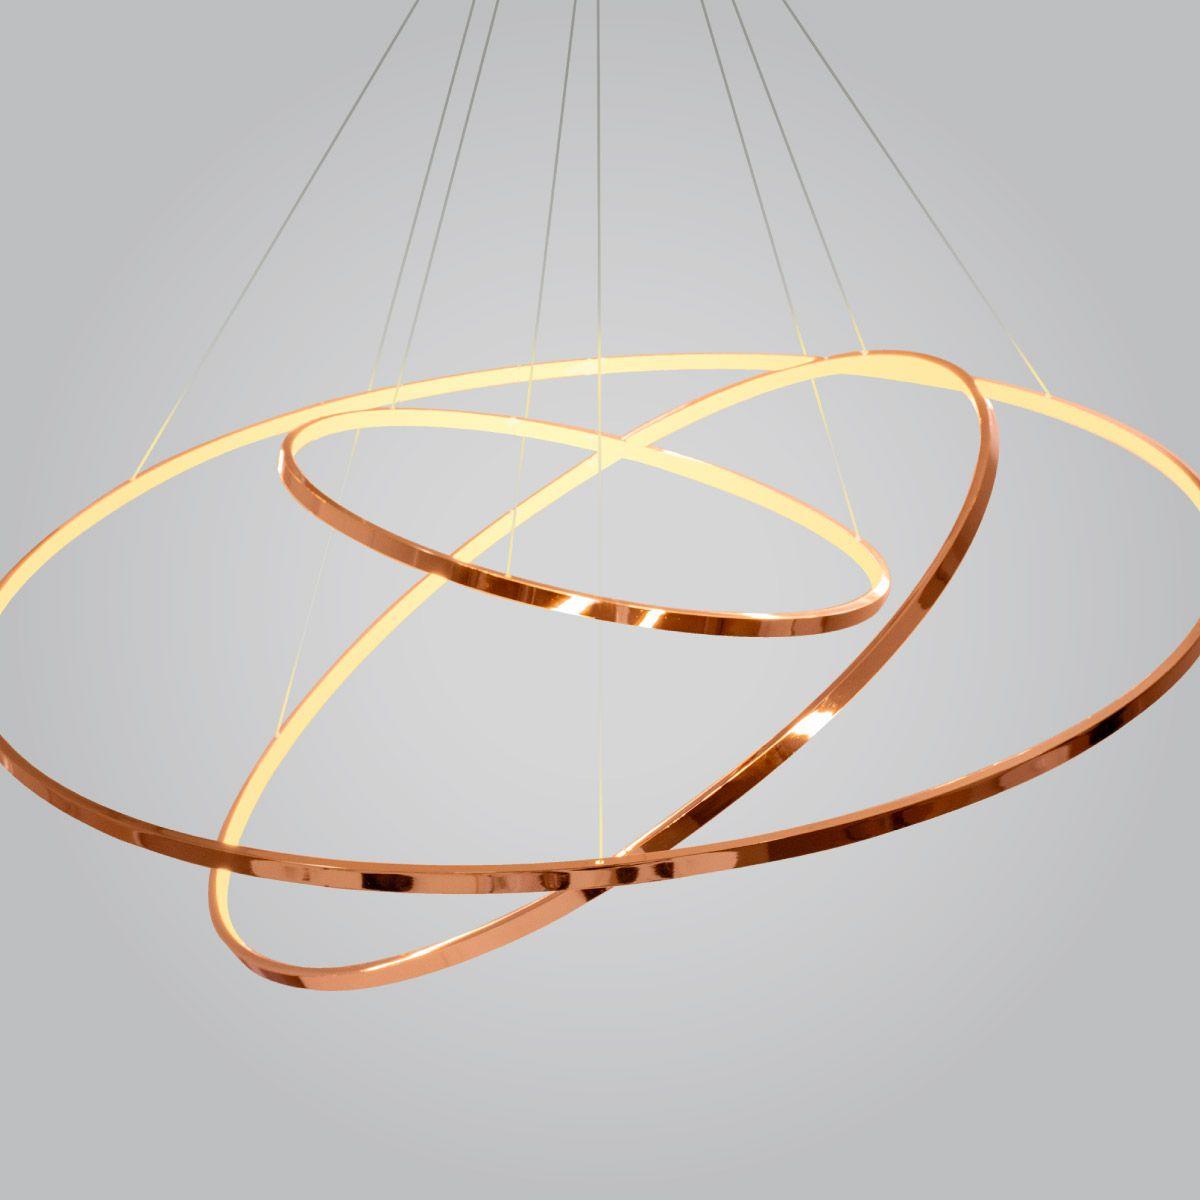 Pendente Rings Birdie Anéis Rosê Gold Cobre 80cm Led 3200K (Branco Quente) 3X39W - KW002E Bella Ø80x42cm